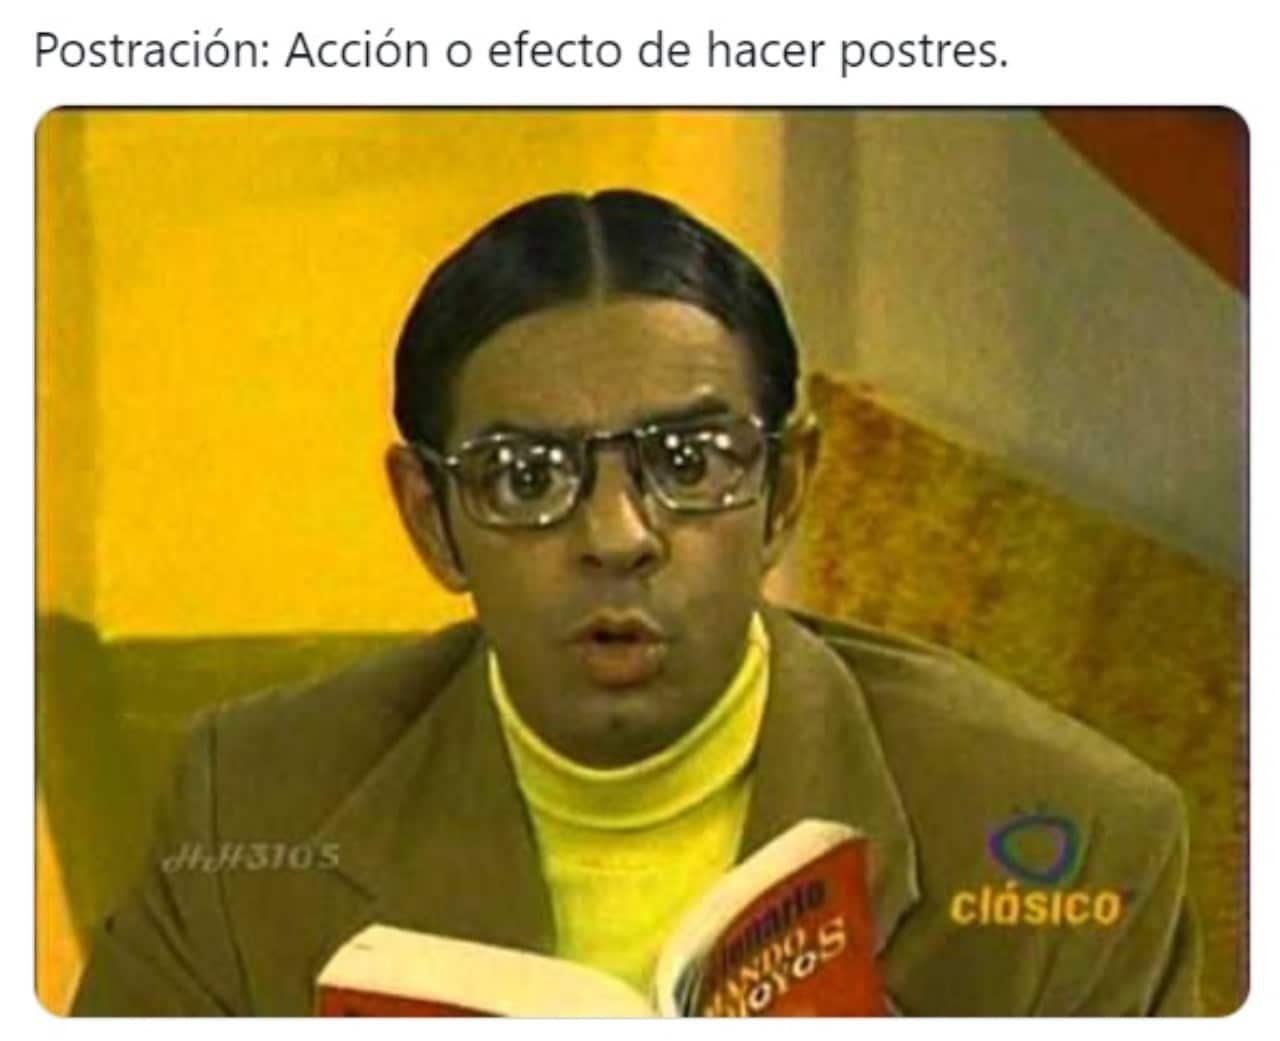 meme Armando Hoyos significado postracion